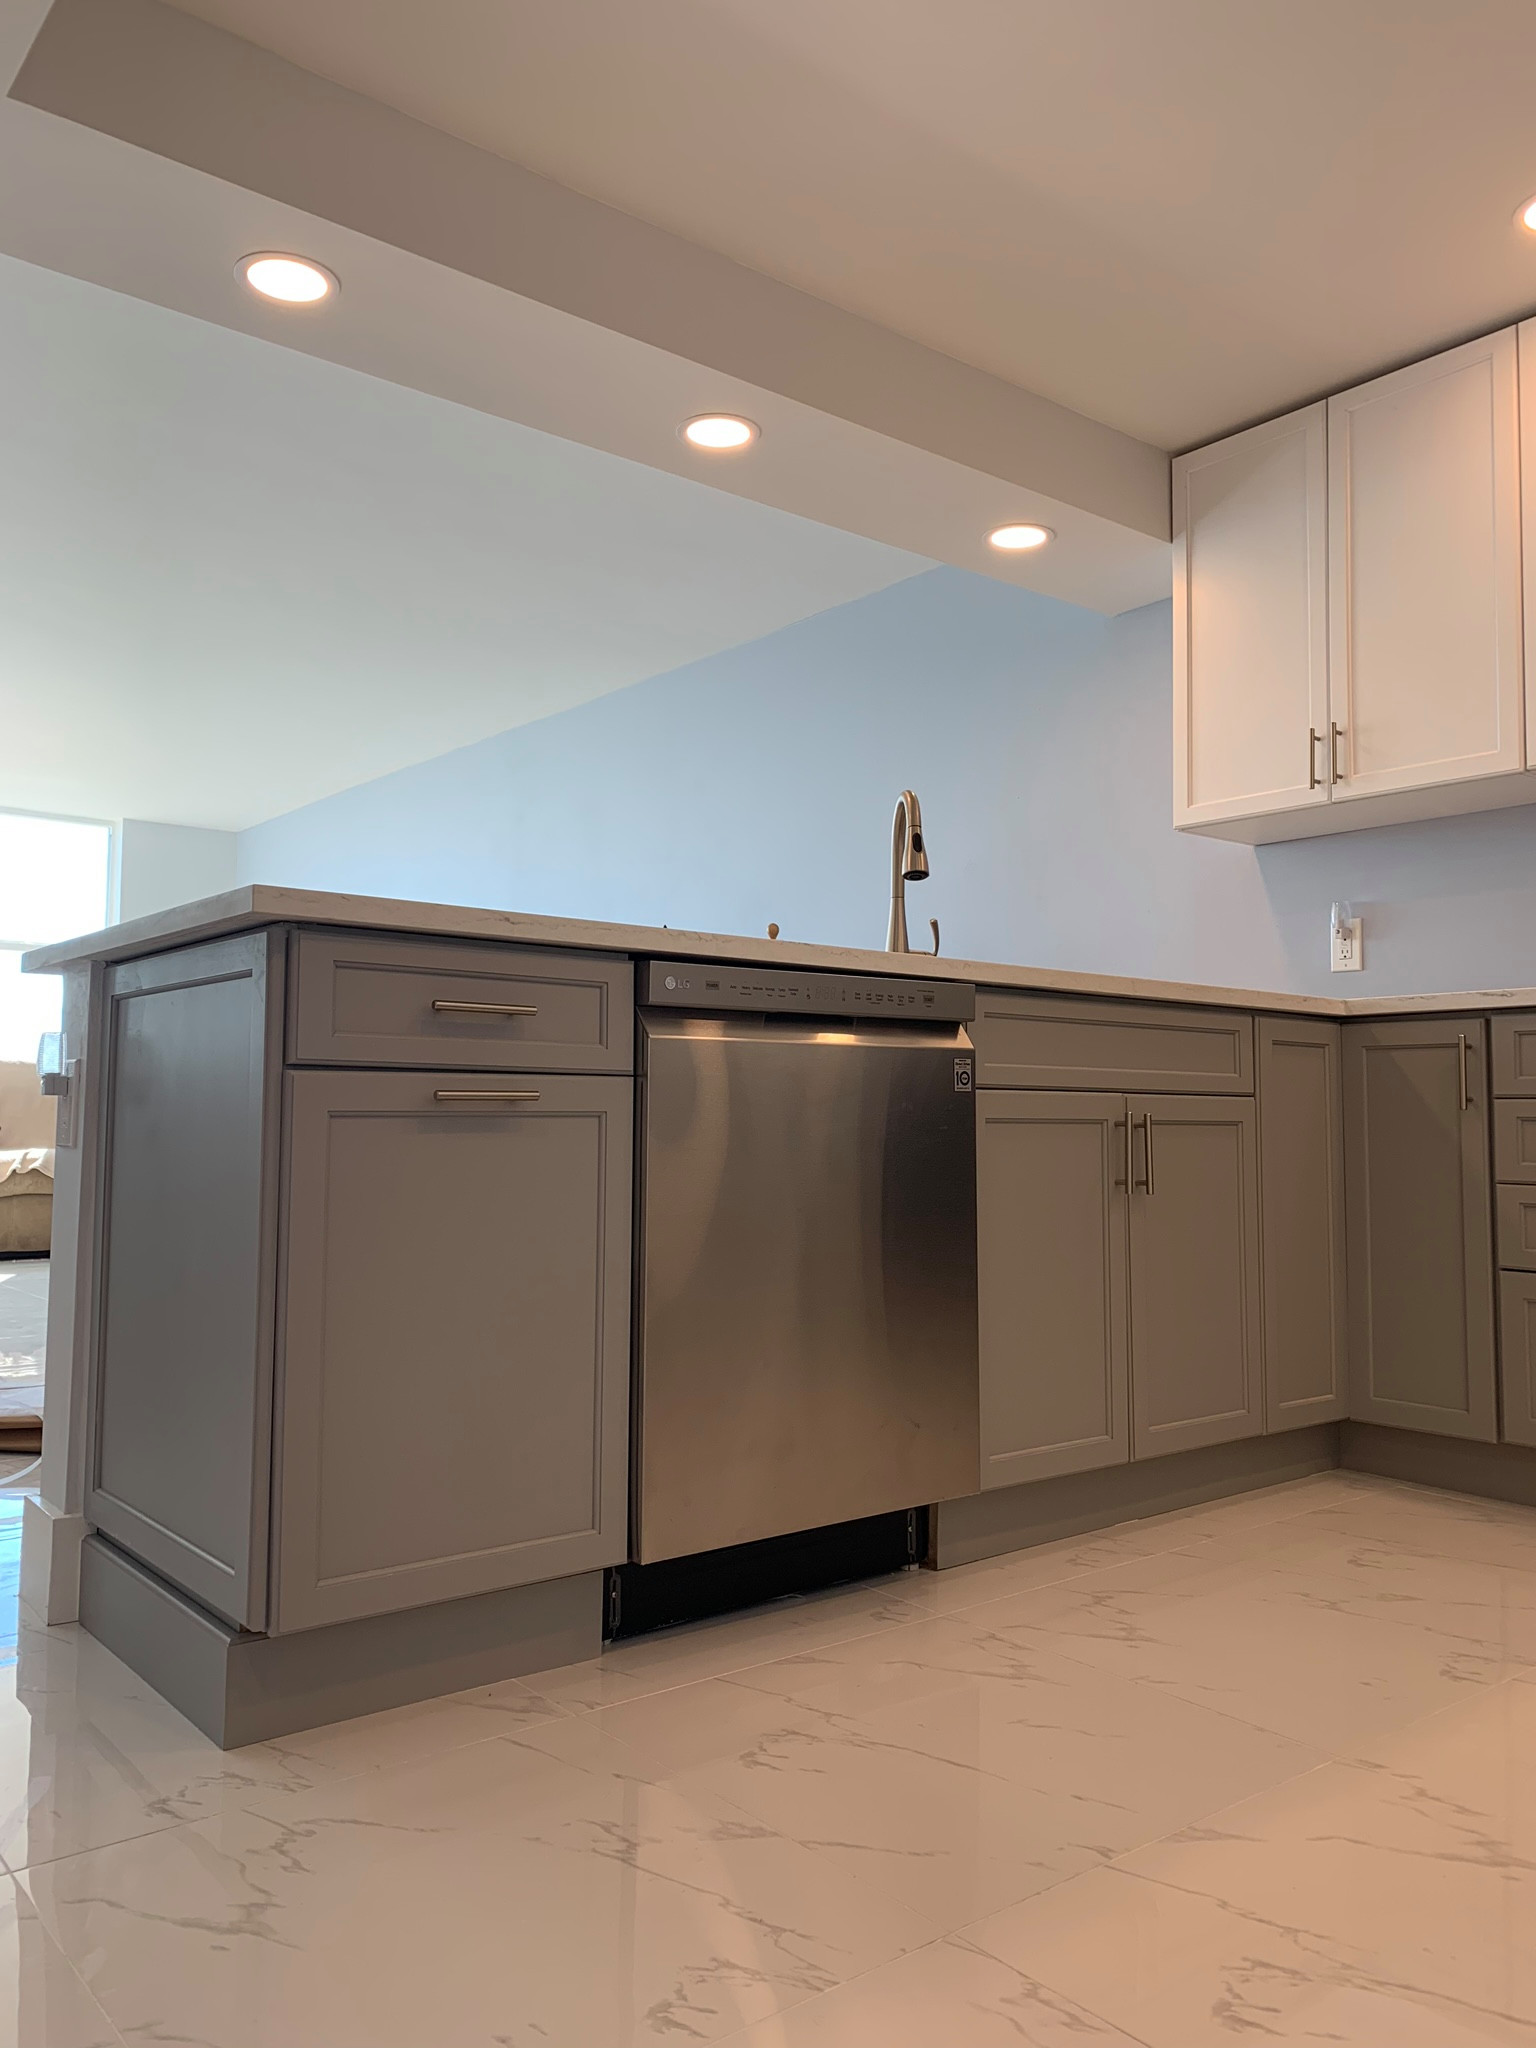 75 Beautiful Black Marble Floor Kitchen Pictures Ideas December 2020 Houzz